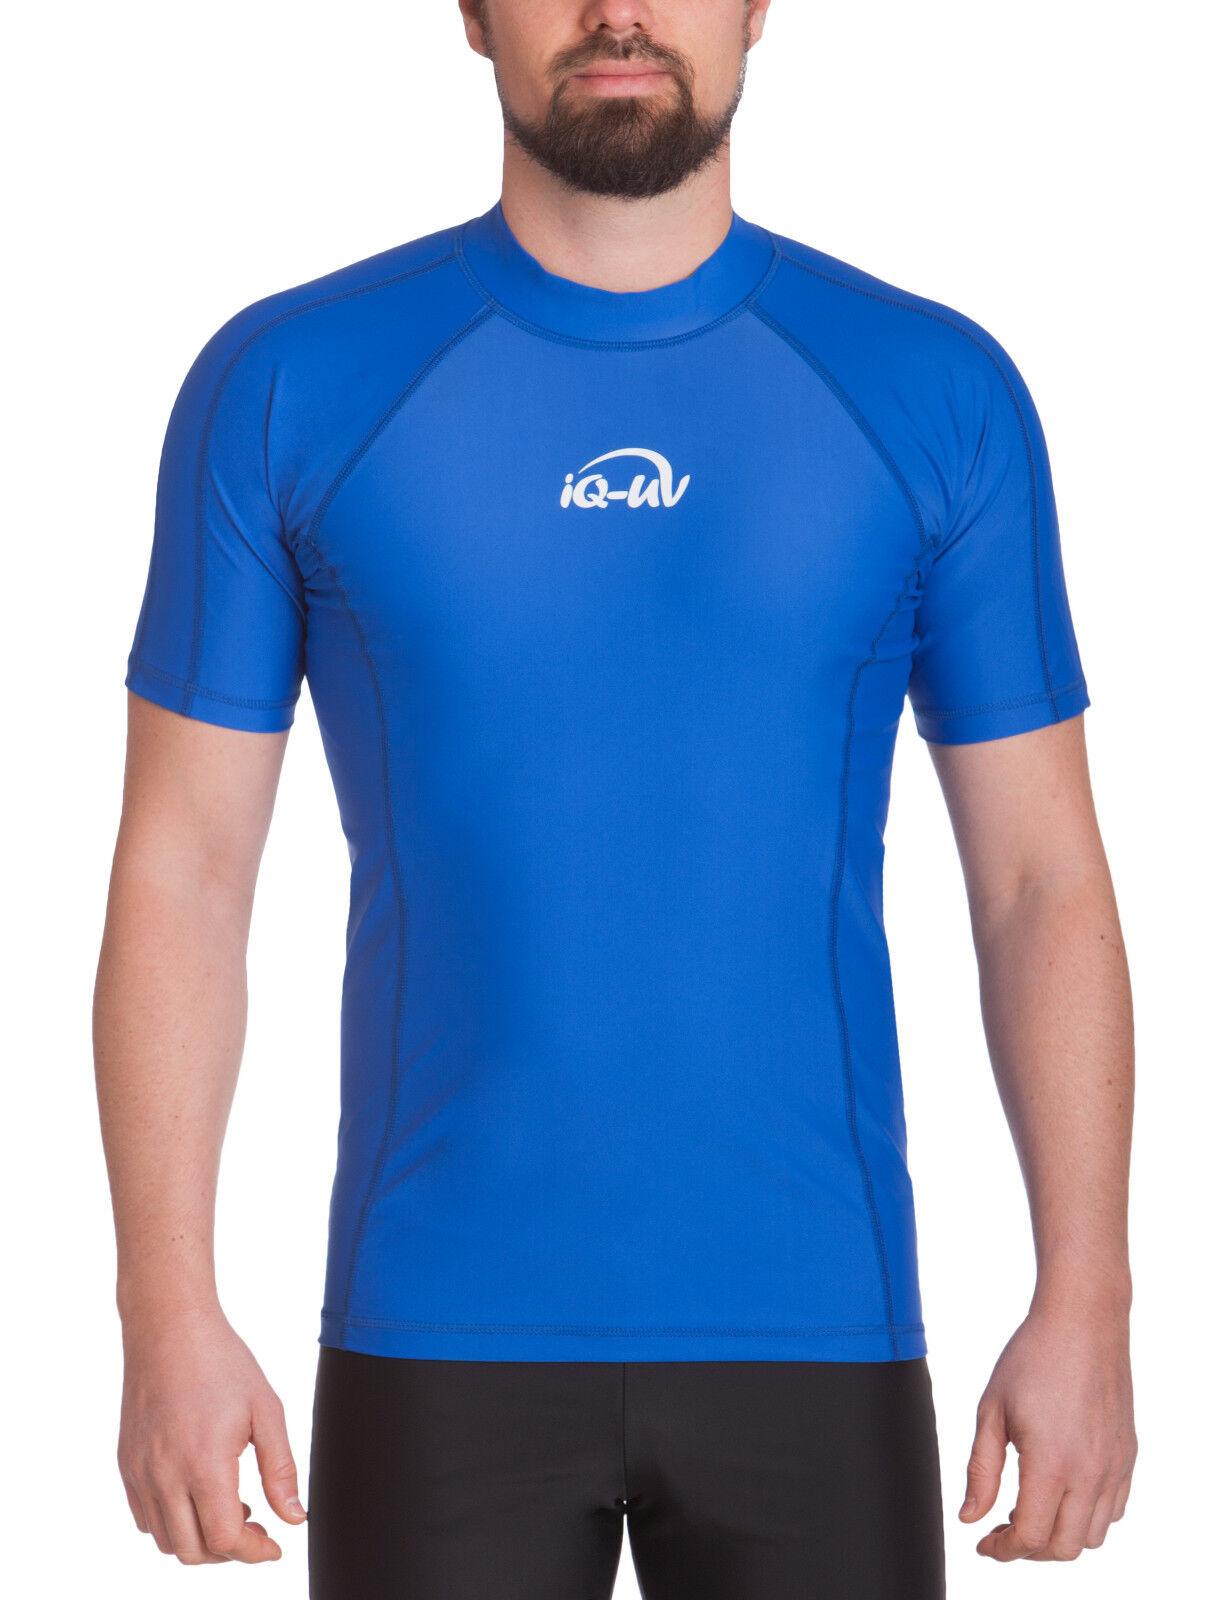 IQ UV 300 300 300 Shirt Slim Fit Men Herren S - 3XL dark-Blau blau Shortsleeve Schutz 12939b